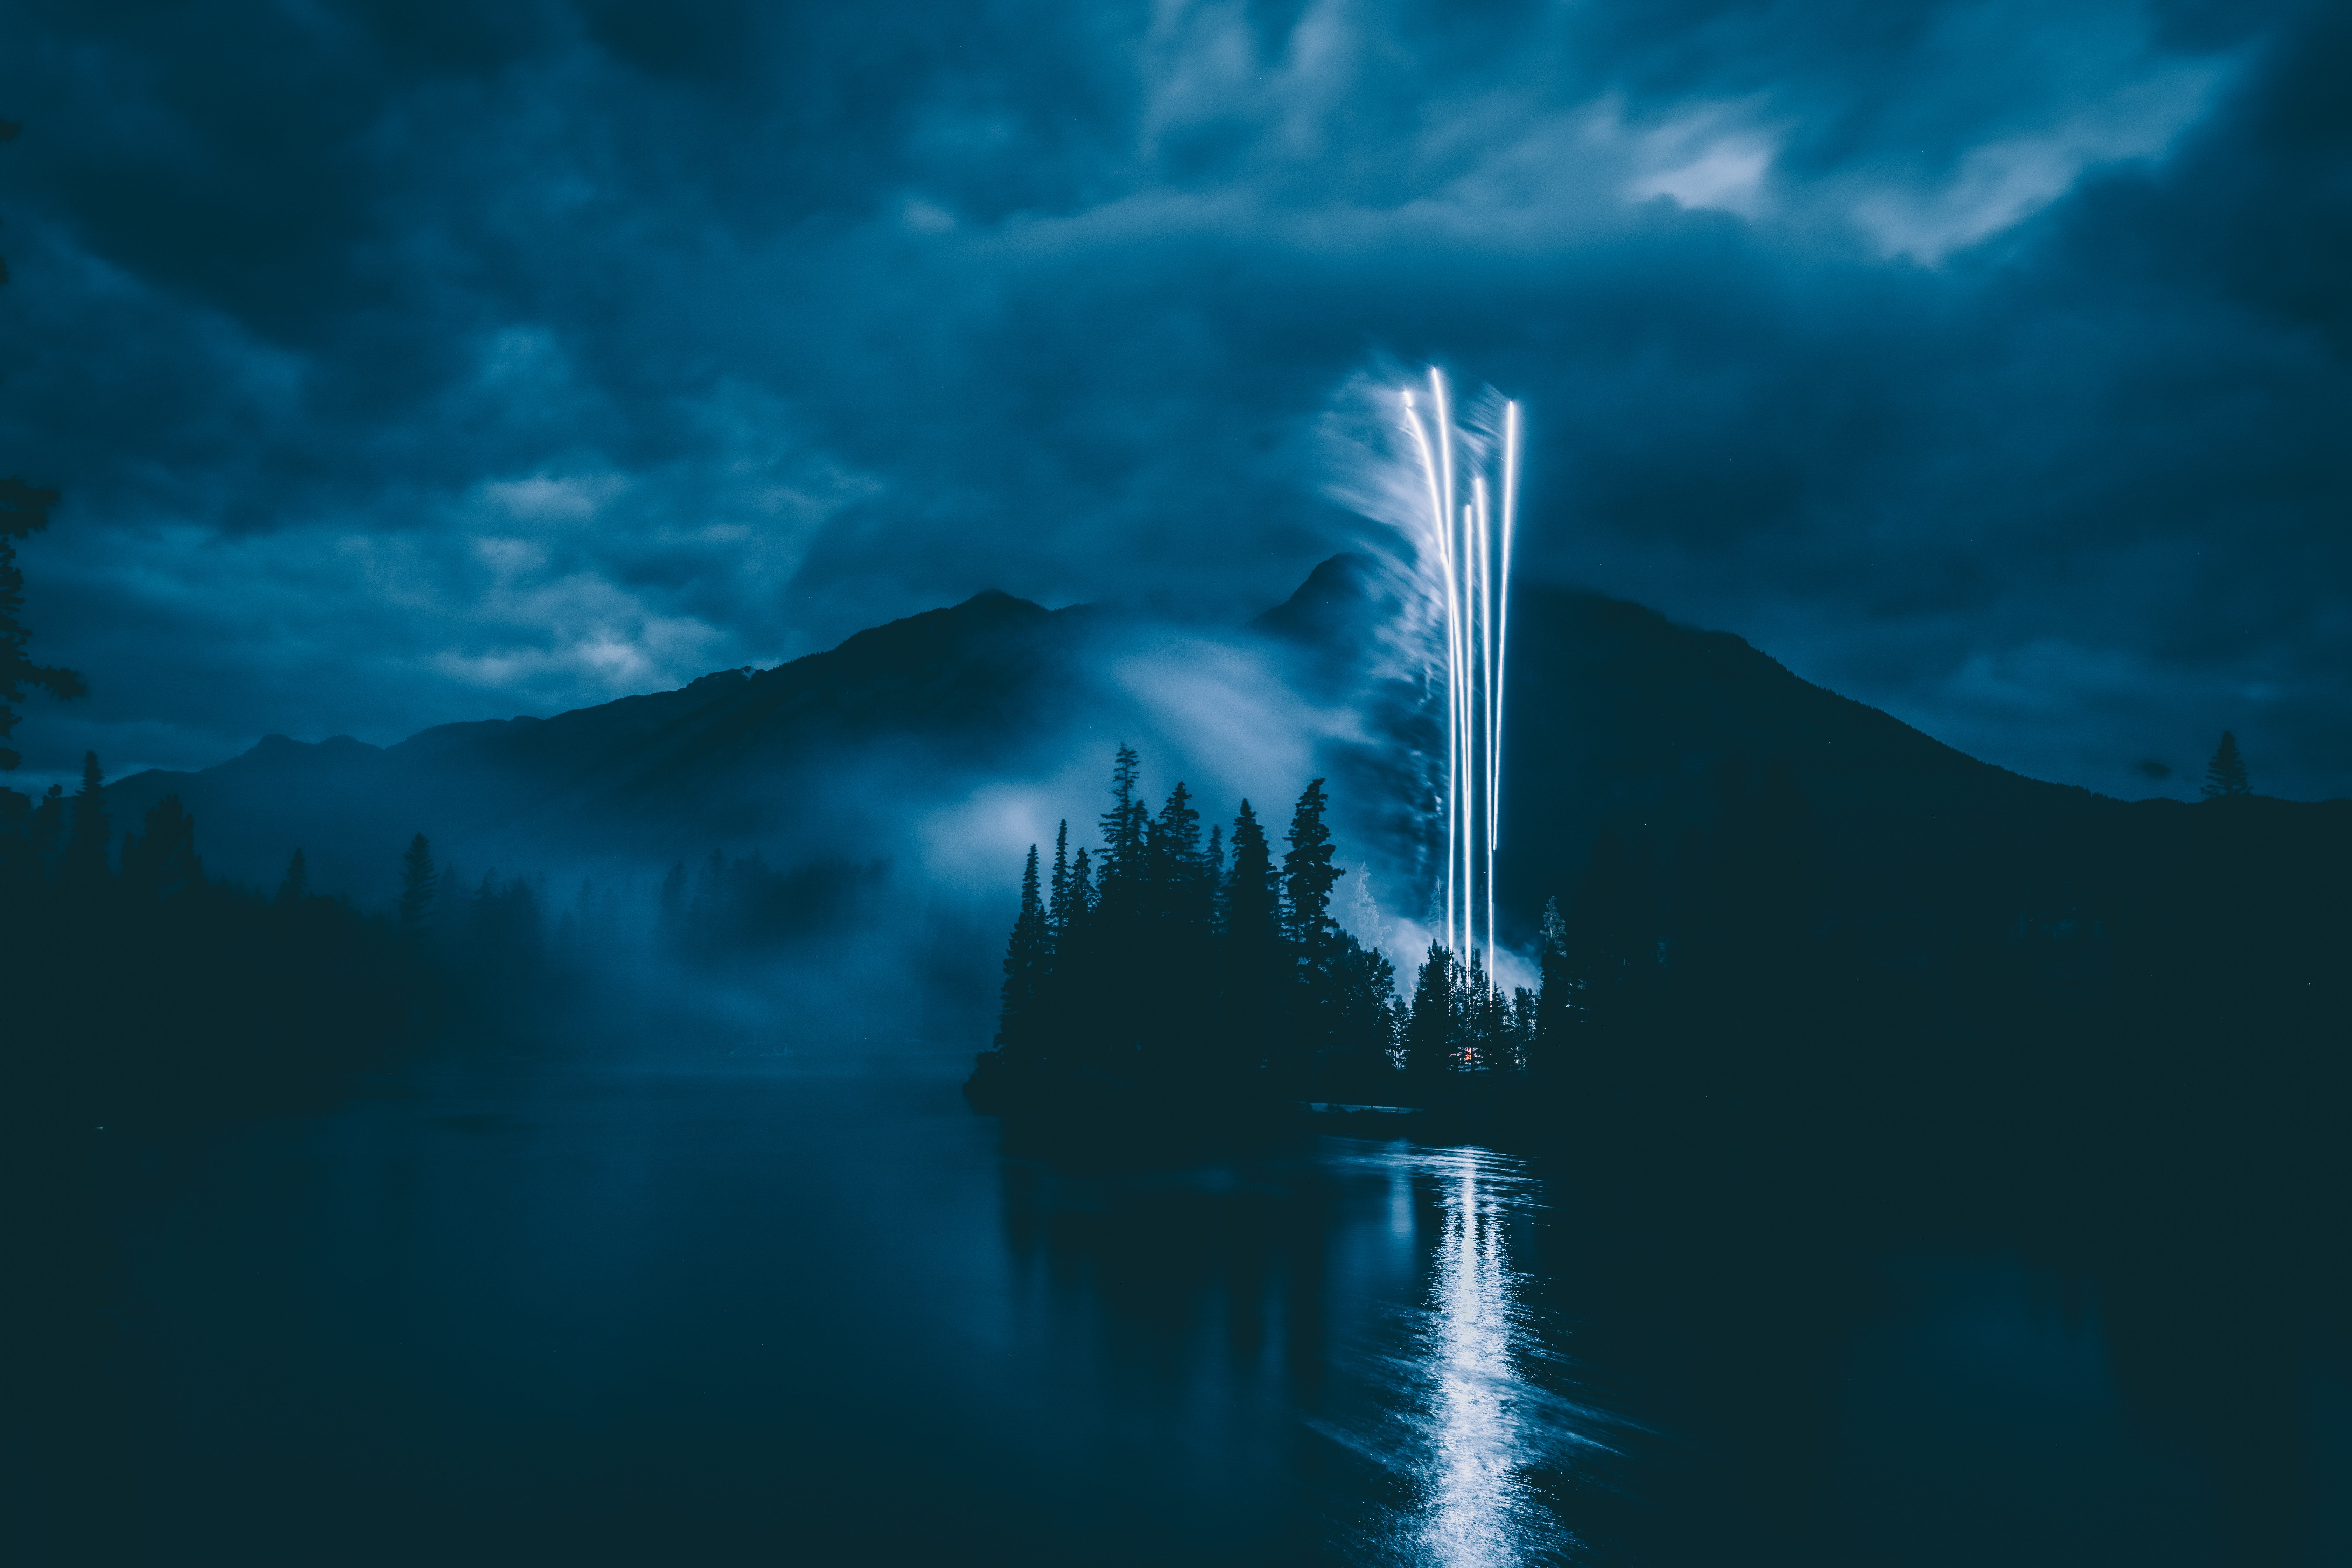 Photography Fireworks 6720x4480